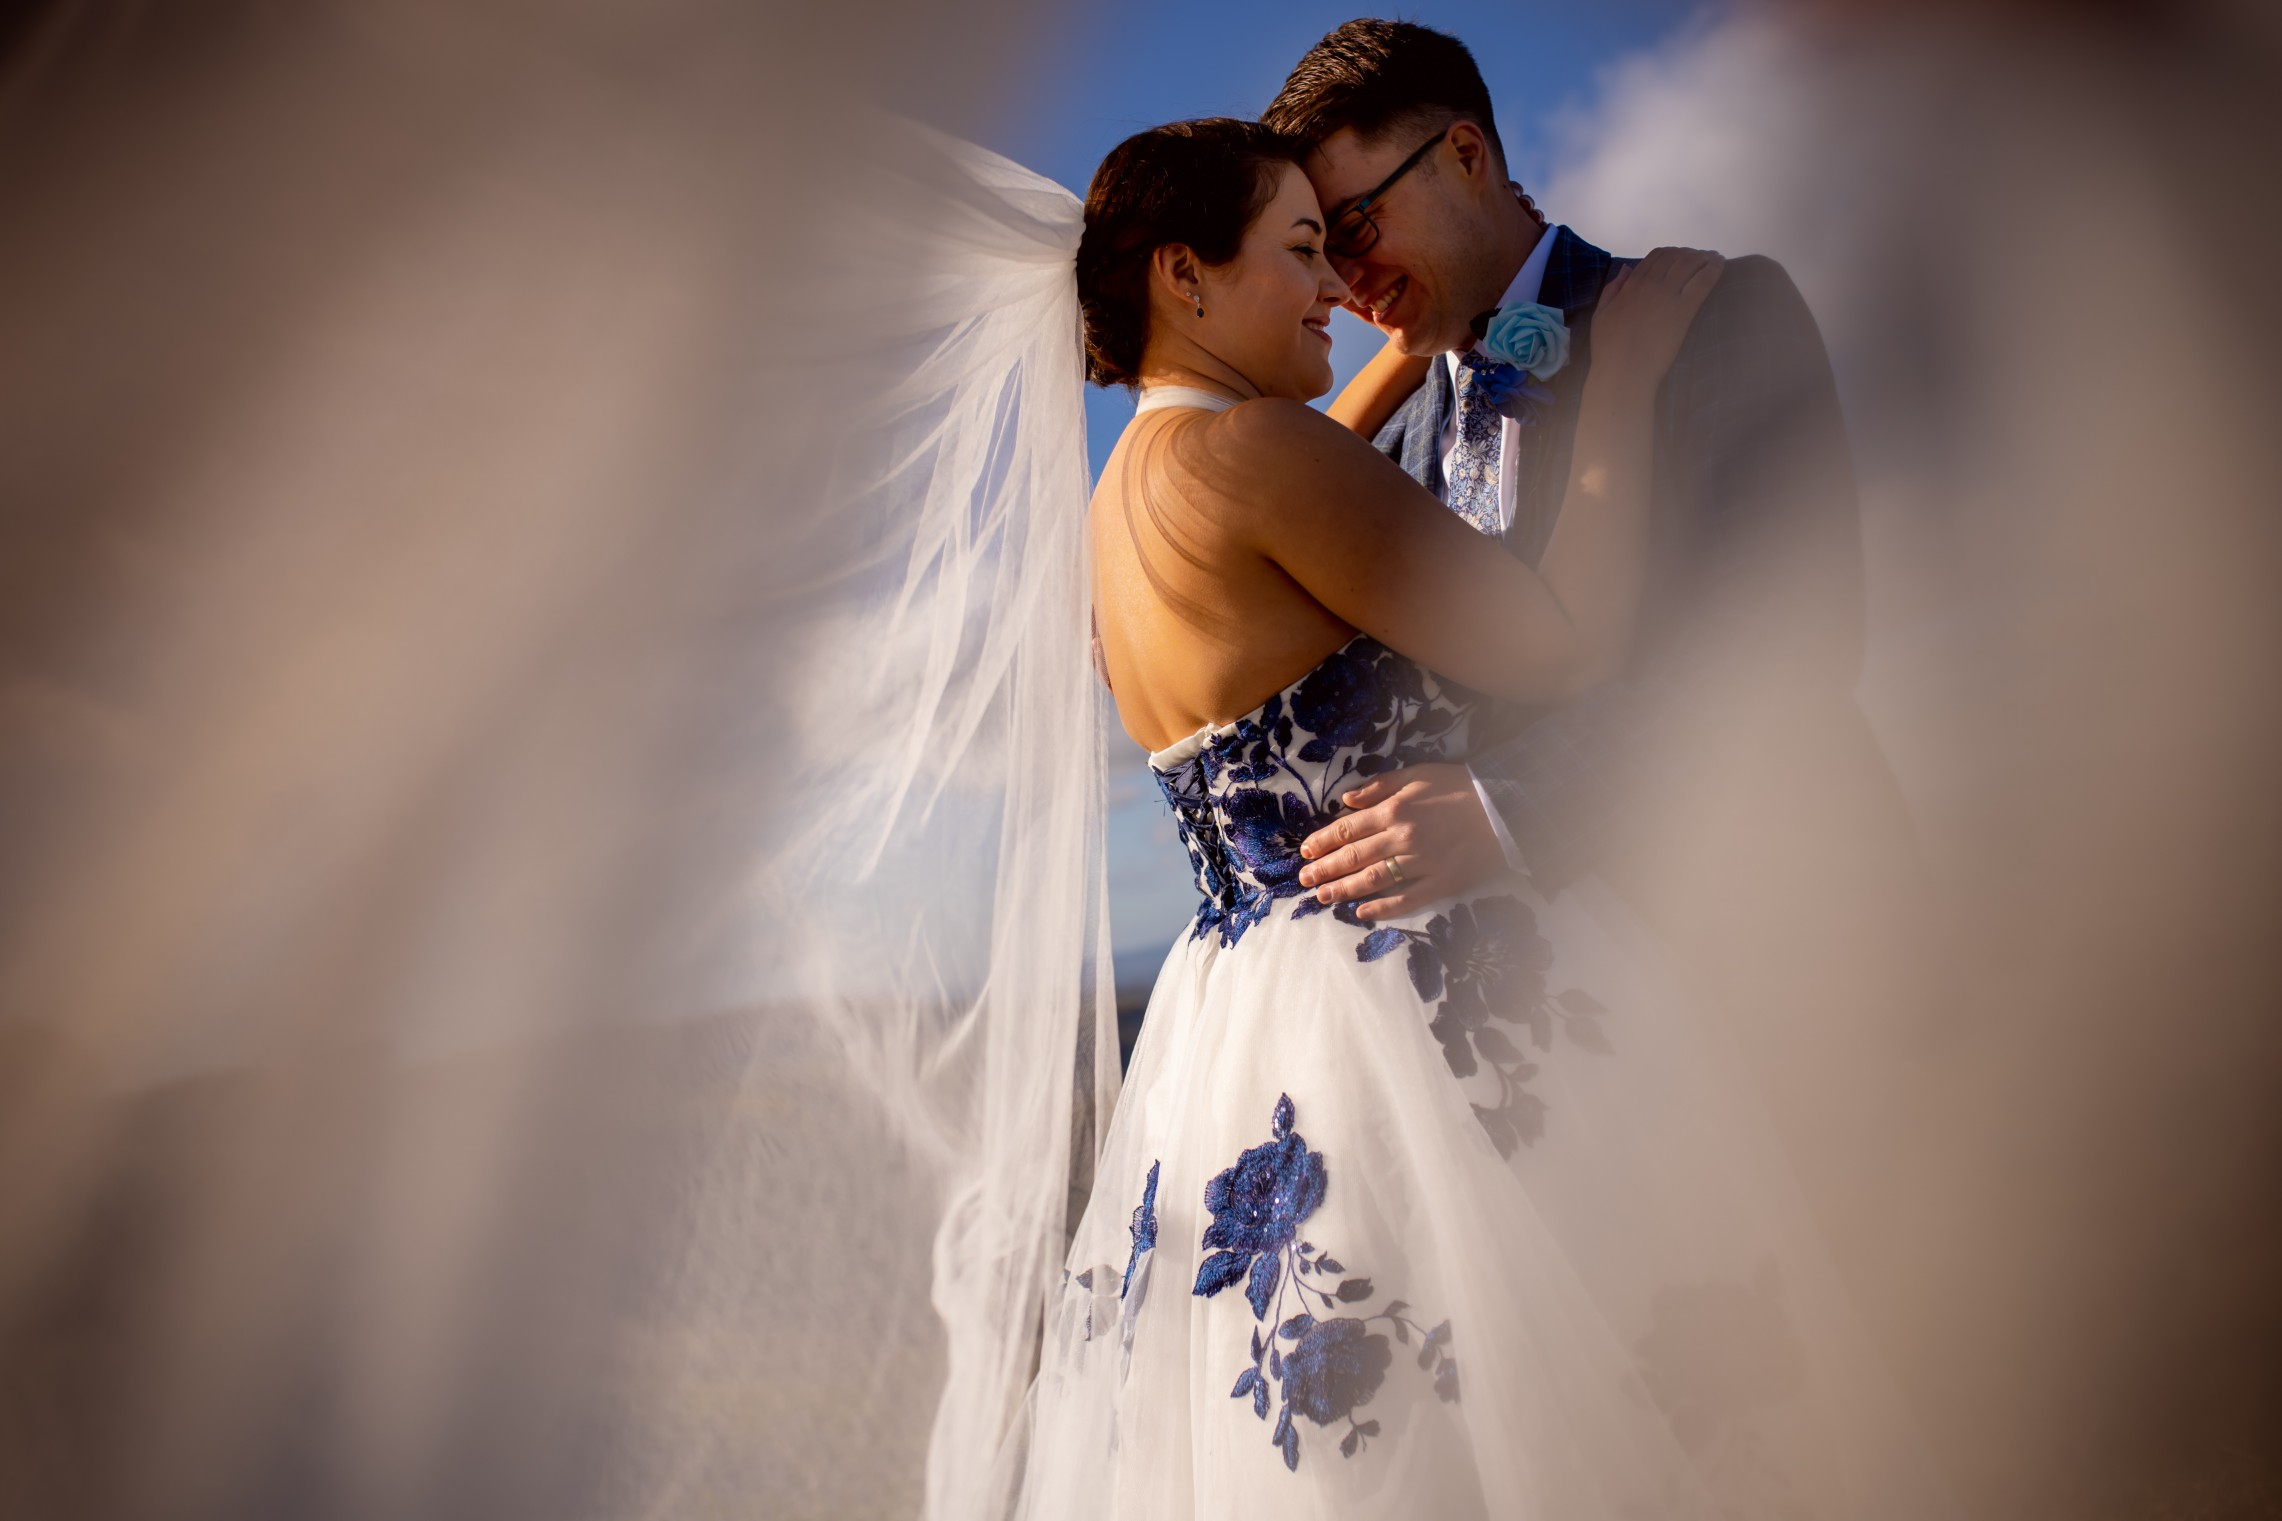 alternative wedding photography - creative wedding photography - artistic wedding photo shoot